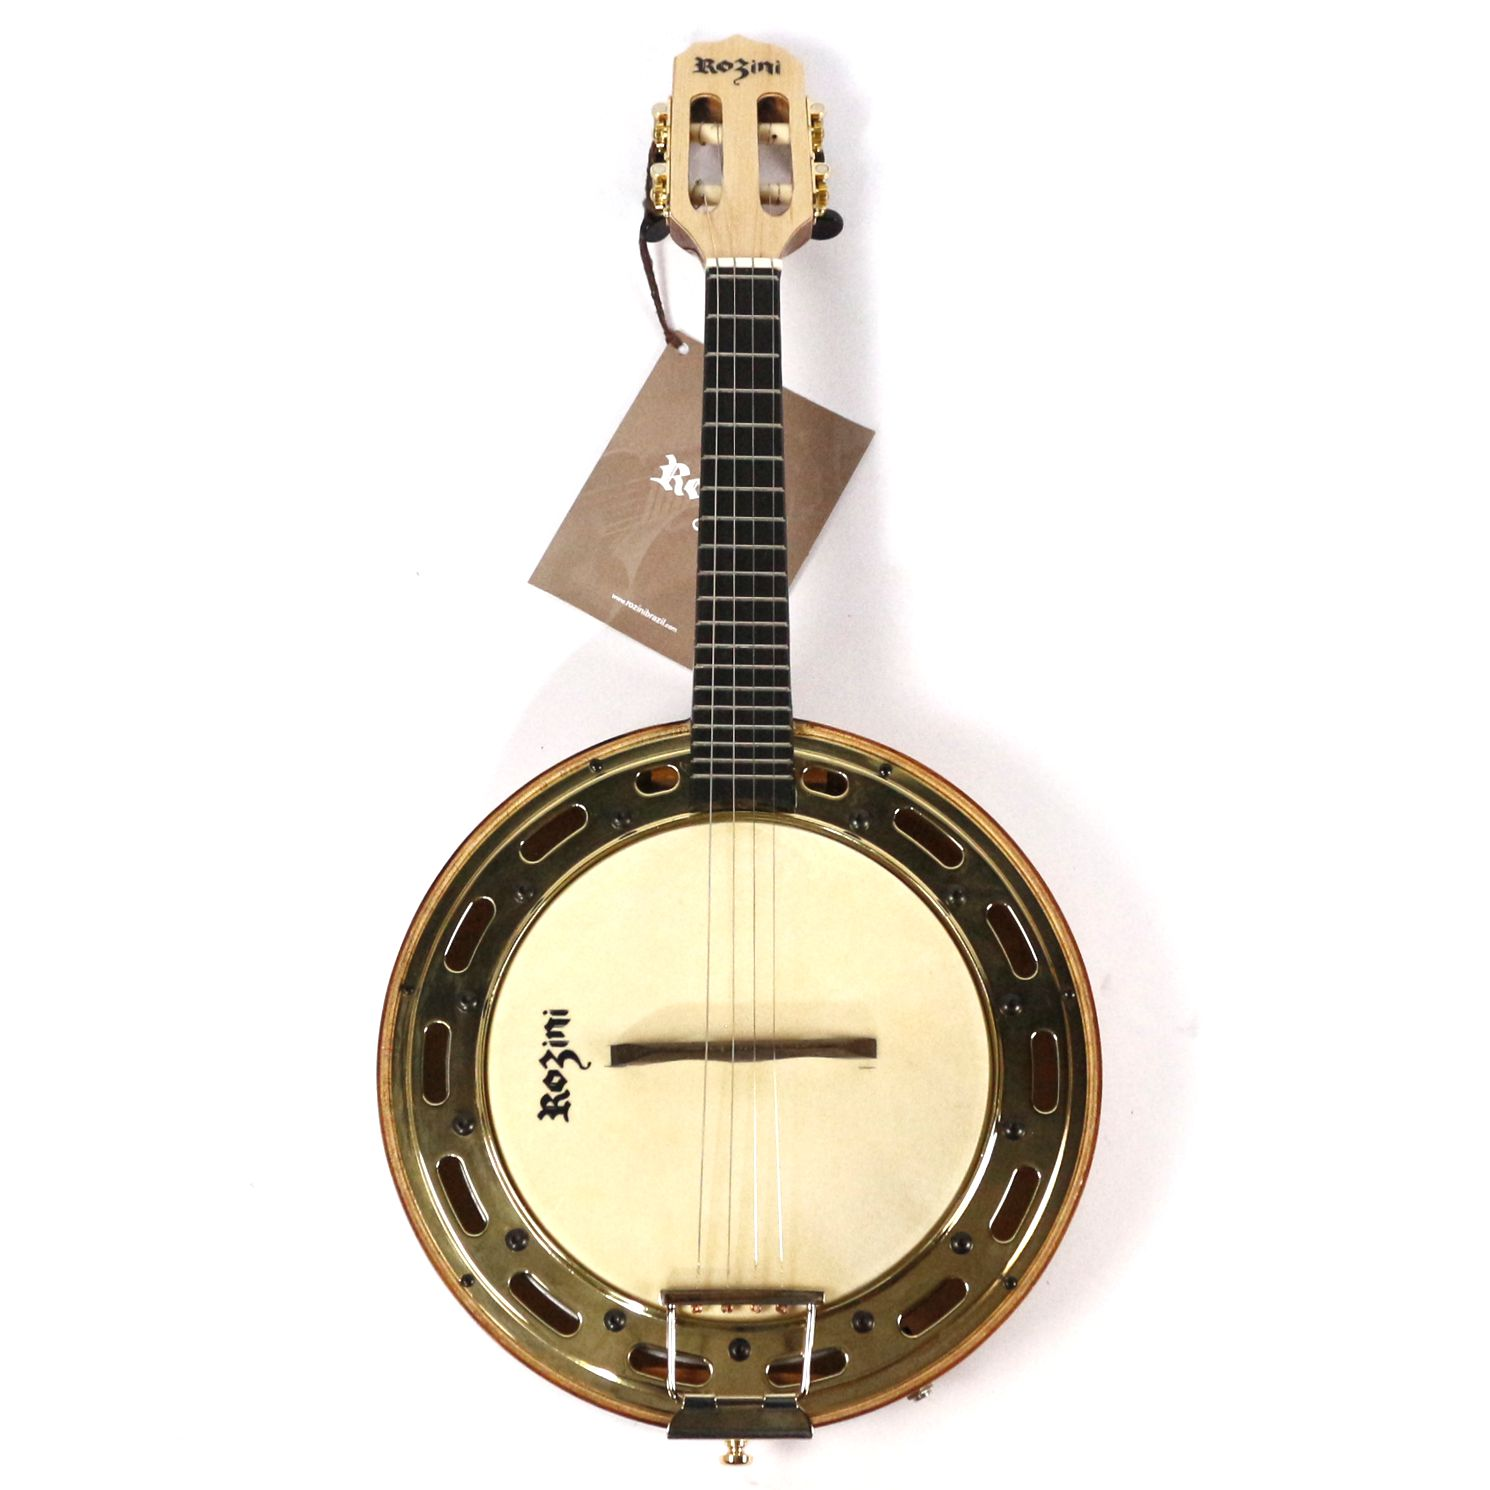 Banjo Profissional Elétrico Claro Rozini RJ13.EL.N.MP